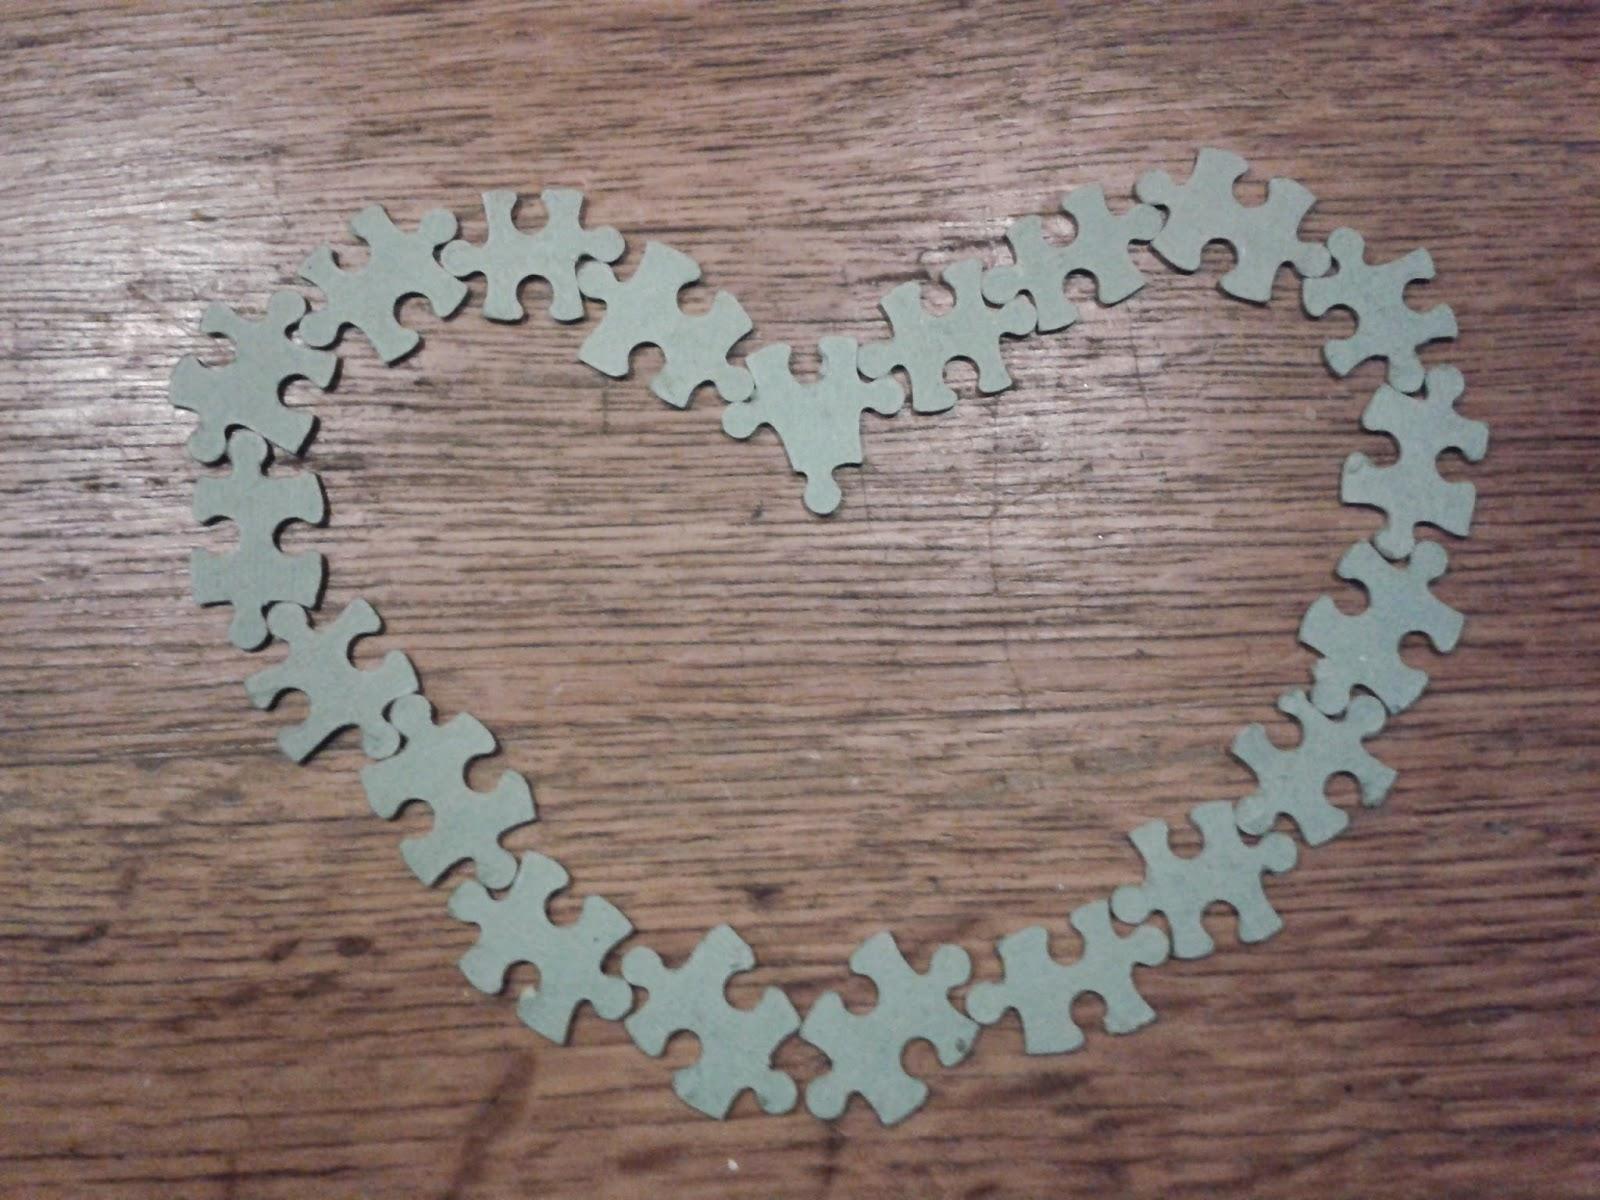 2014 03 18+20.15.09 - Hartje van puzzels